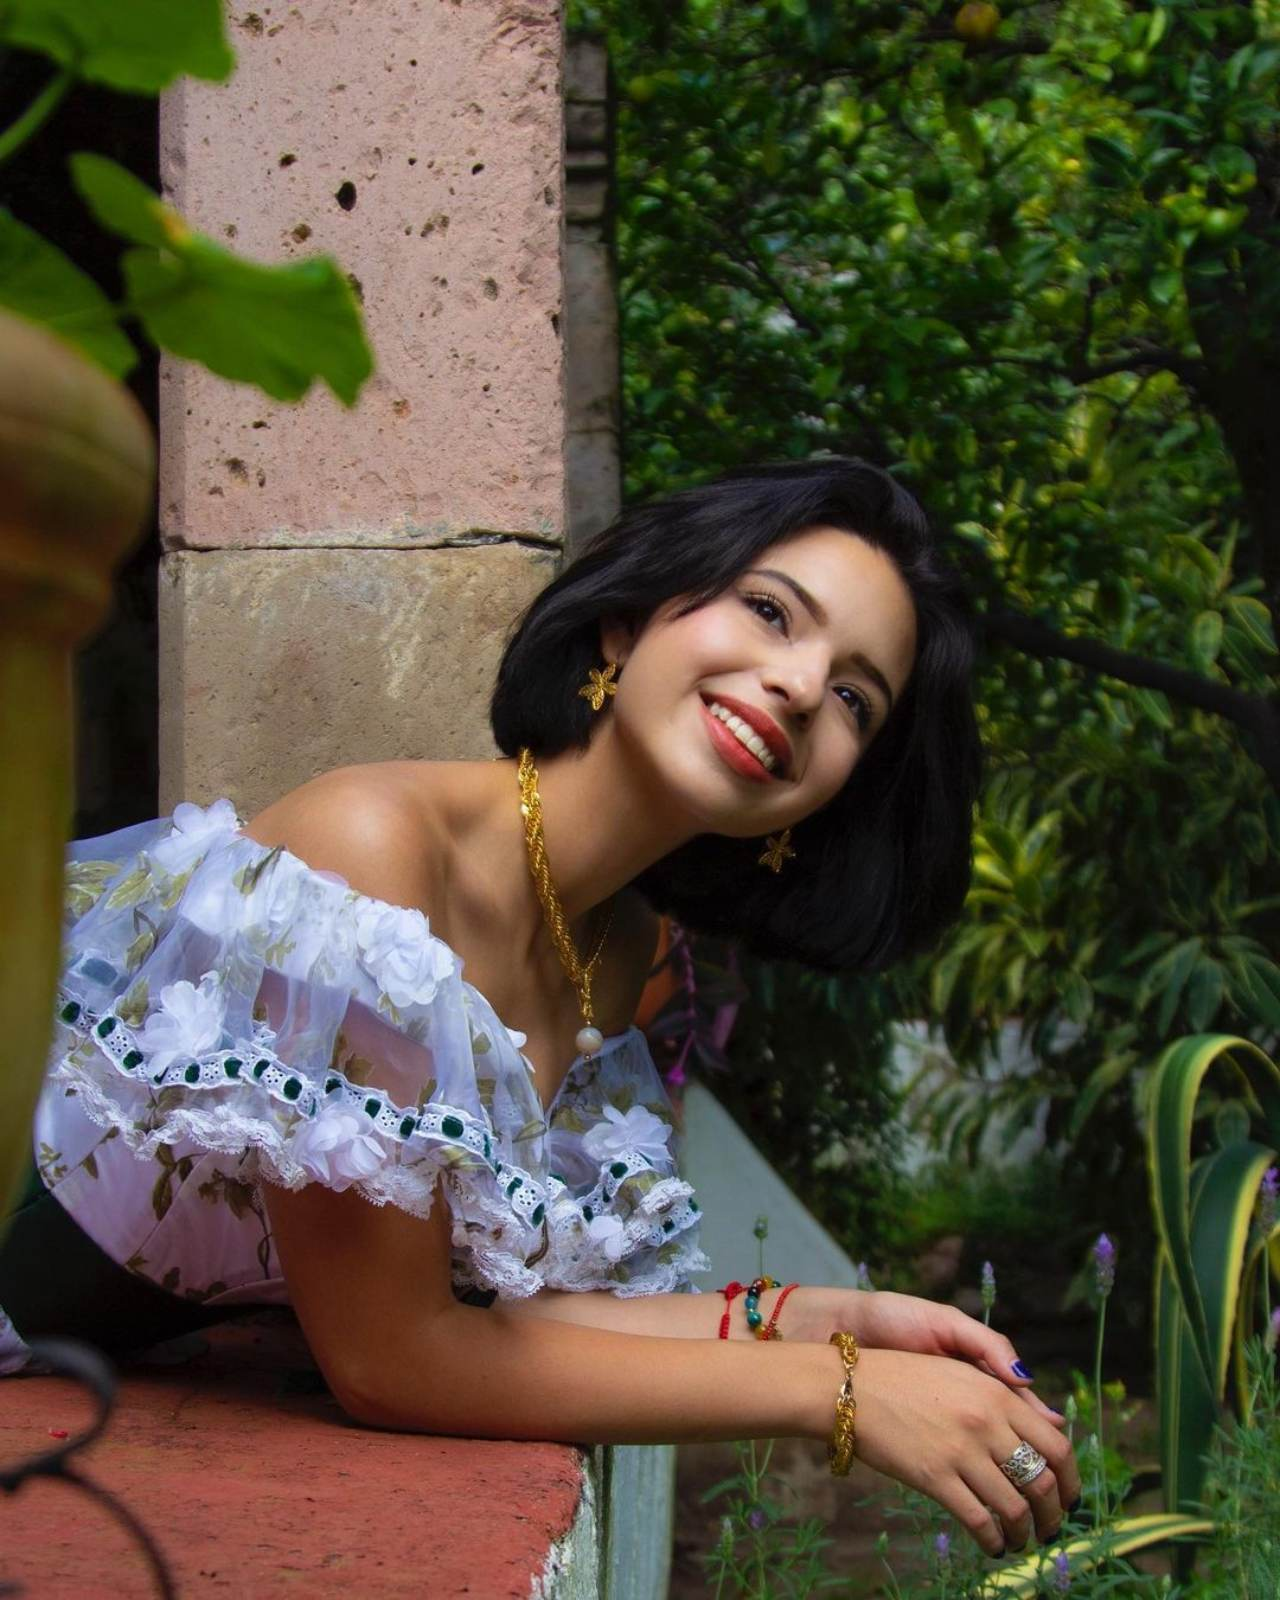 Angela Aguilar asomándose por el balcón